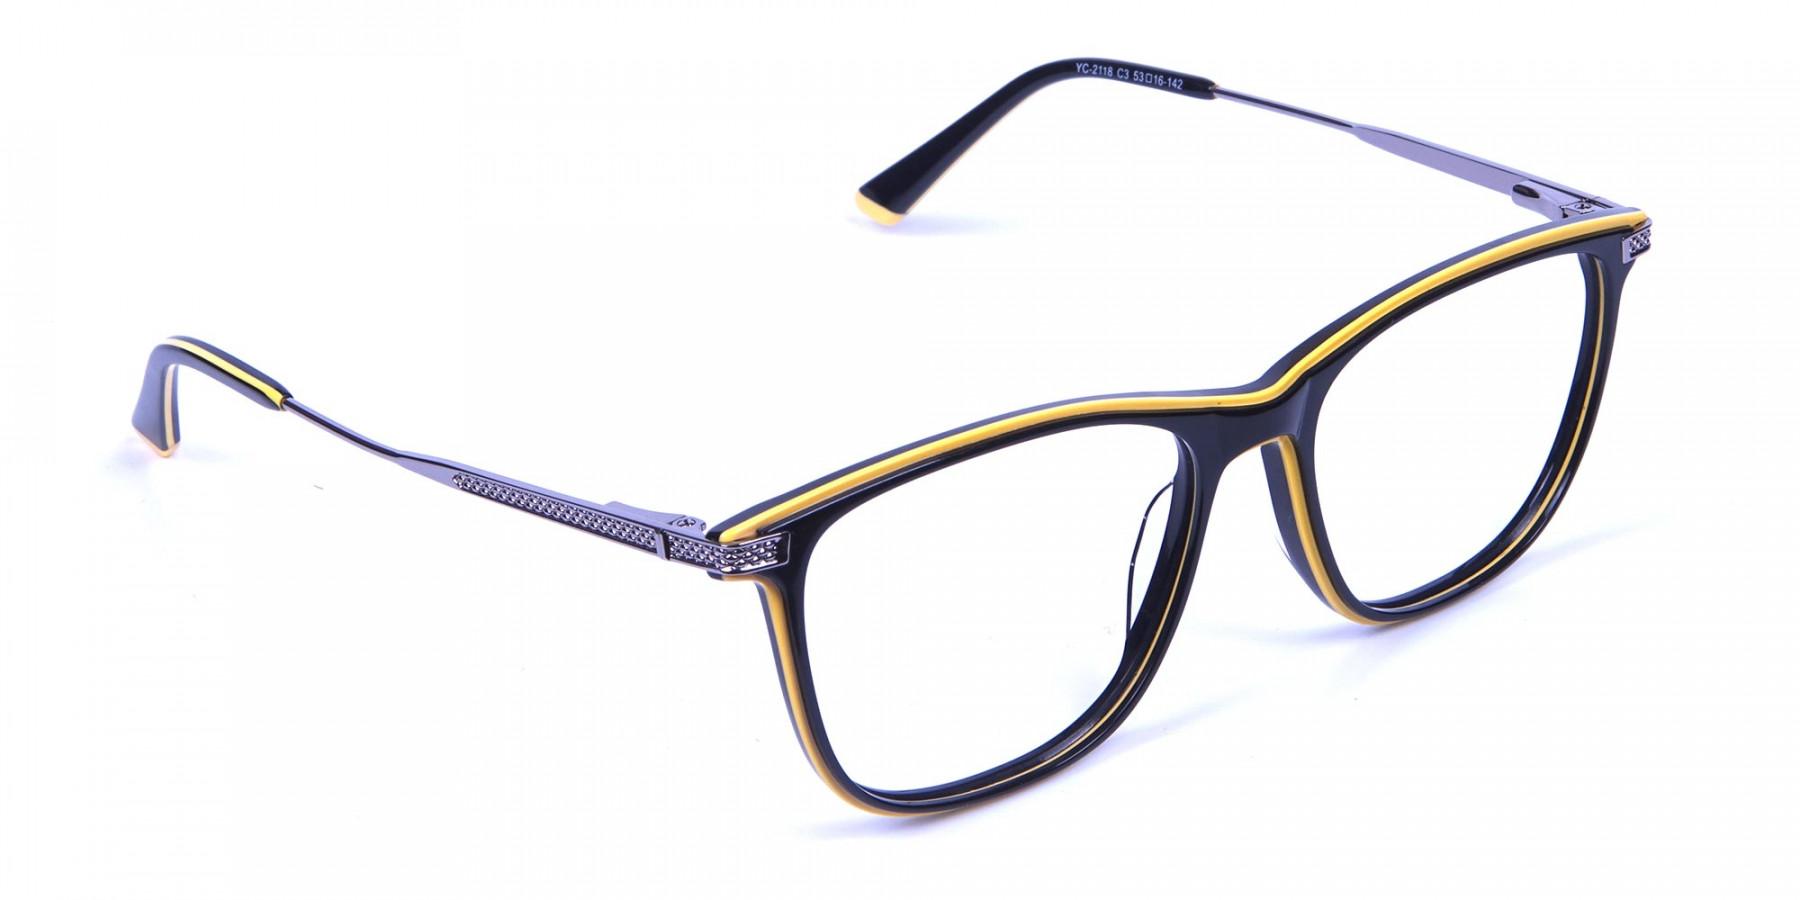 Black & Yellow Rimmed Frames